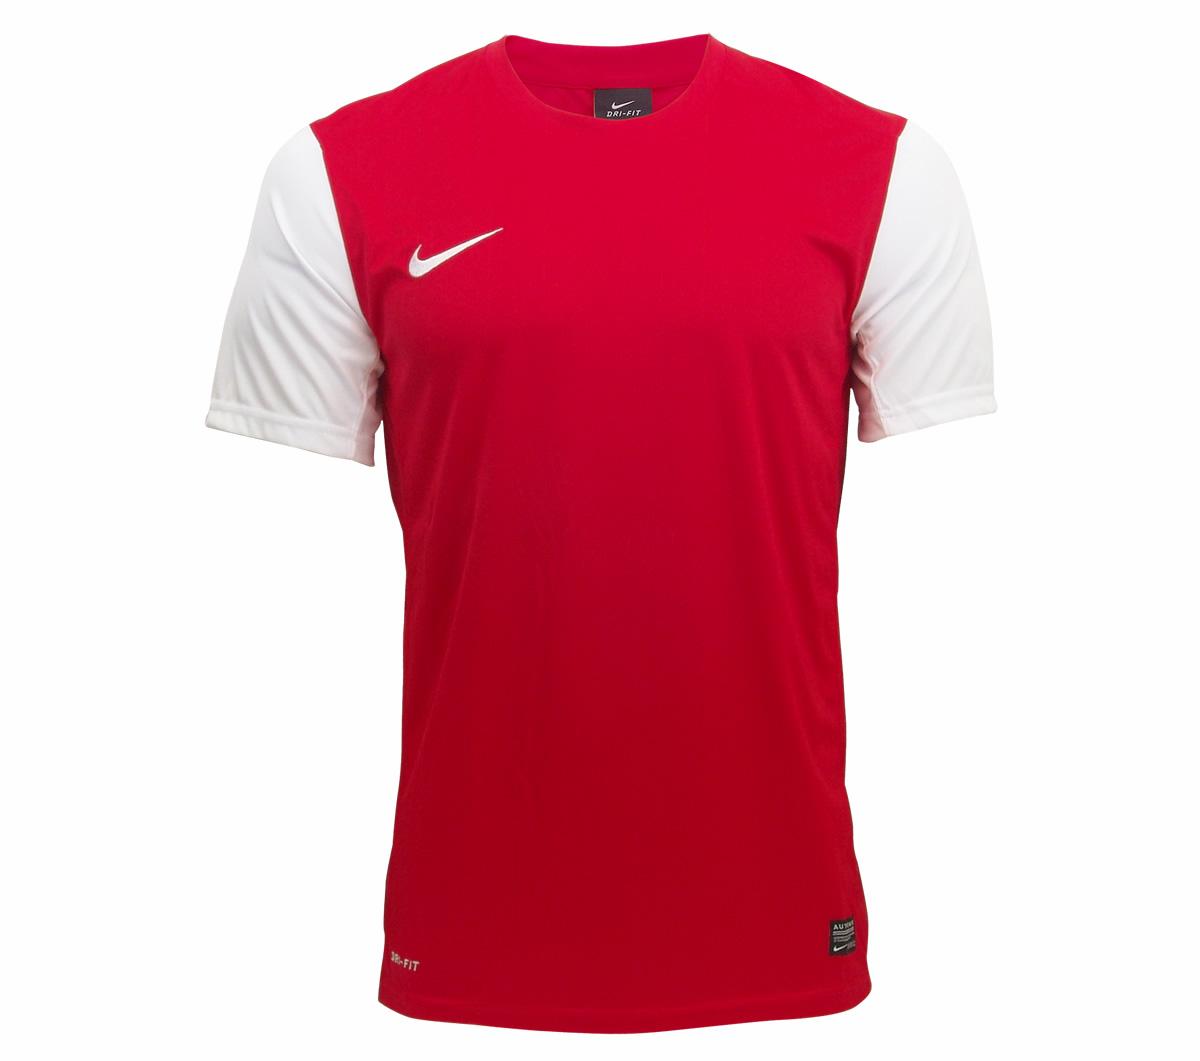 Camisa Nike Classic IV Vermelha Camisa Nike Classic IV Vermelha ... 918b6b93fd49e